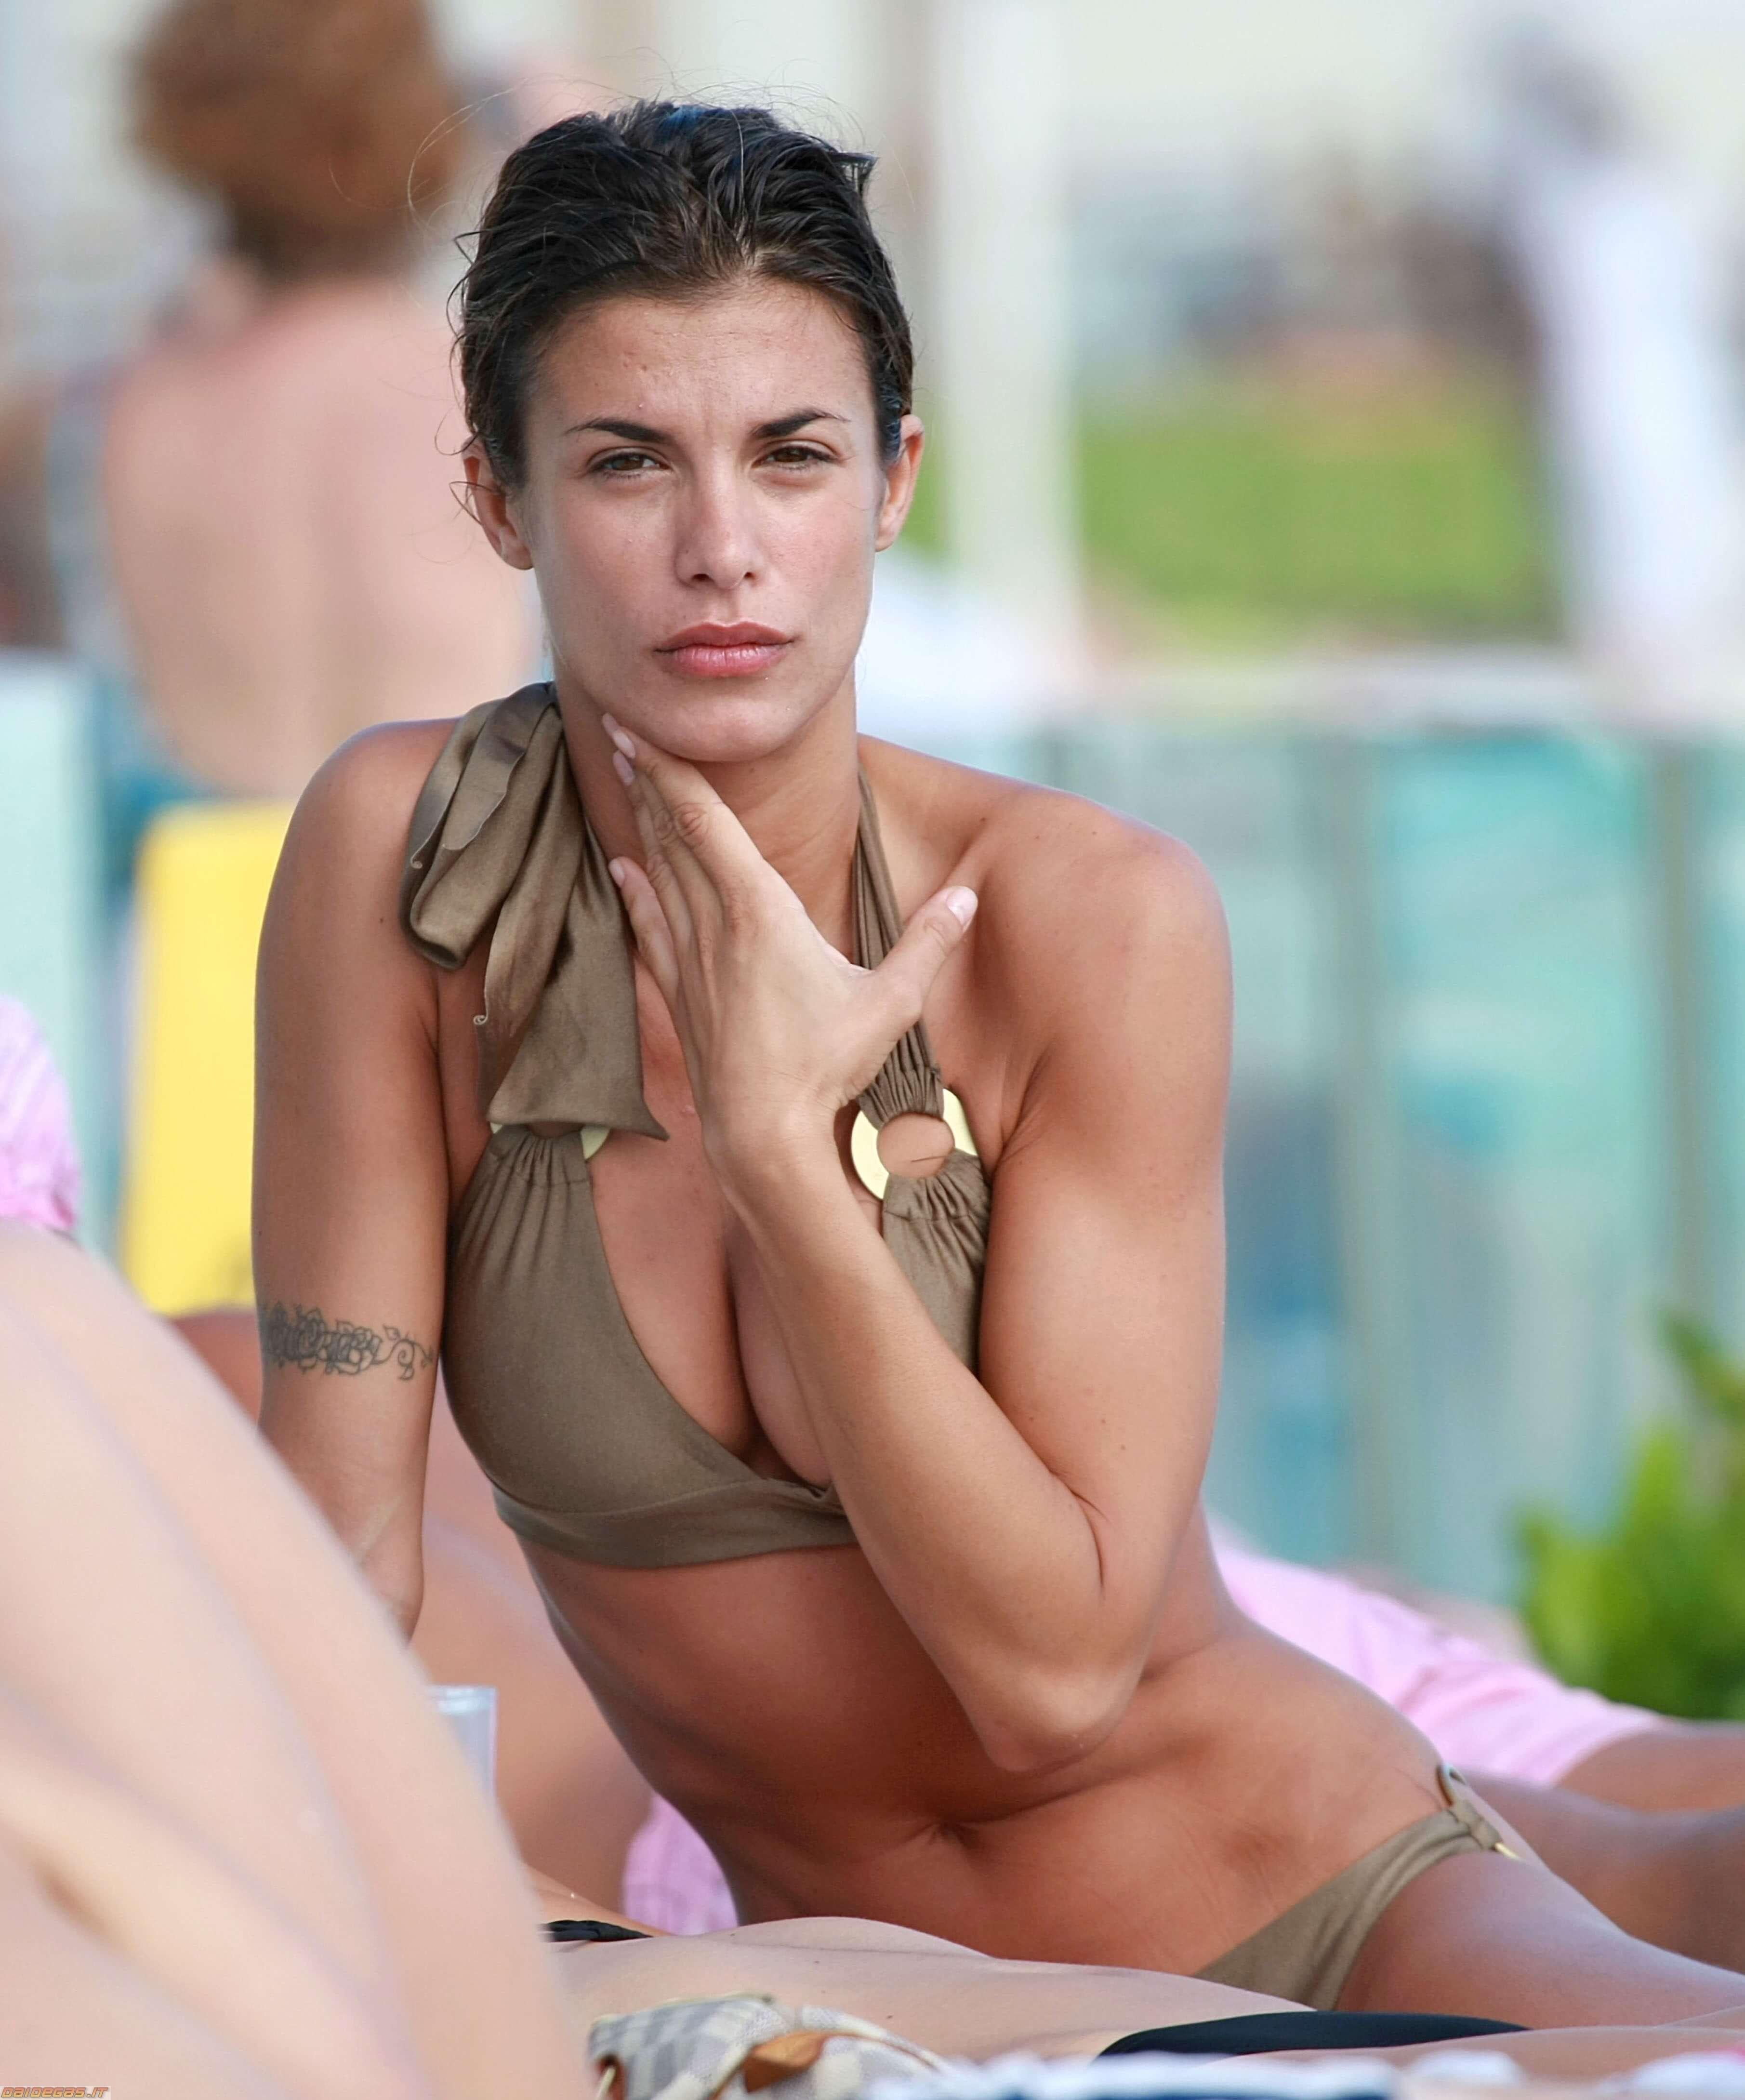 elisabetta-canalis-bikini-video-women-pussy-porn